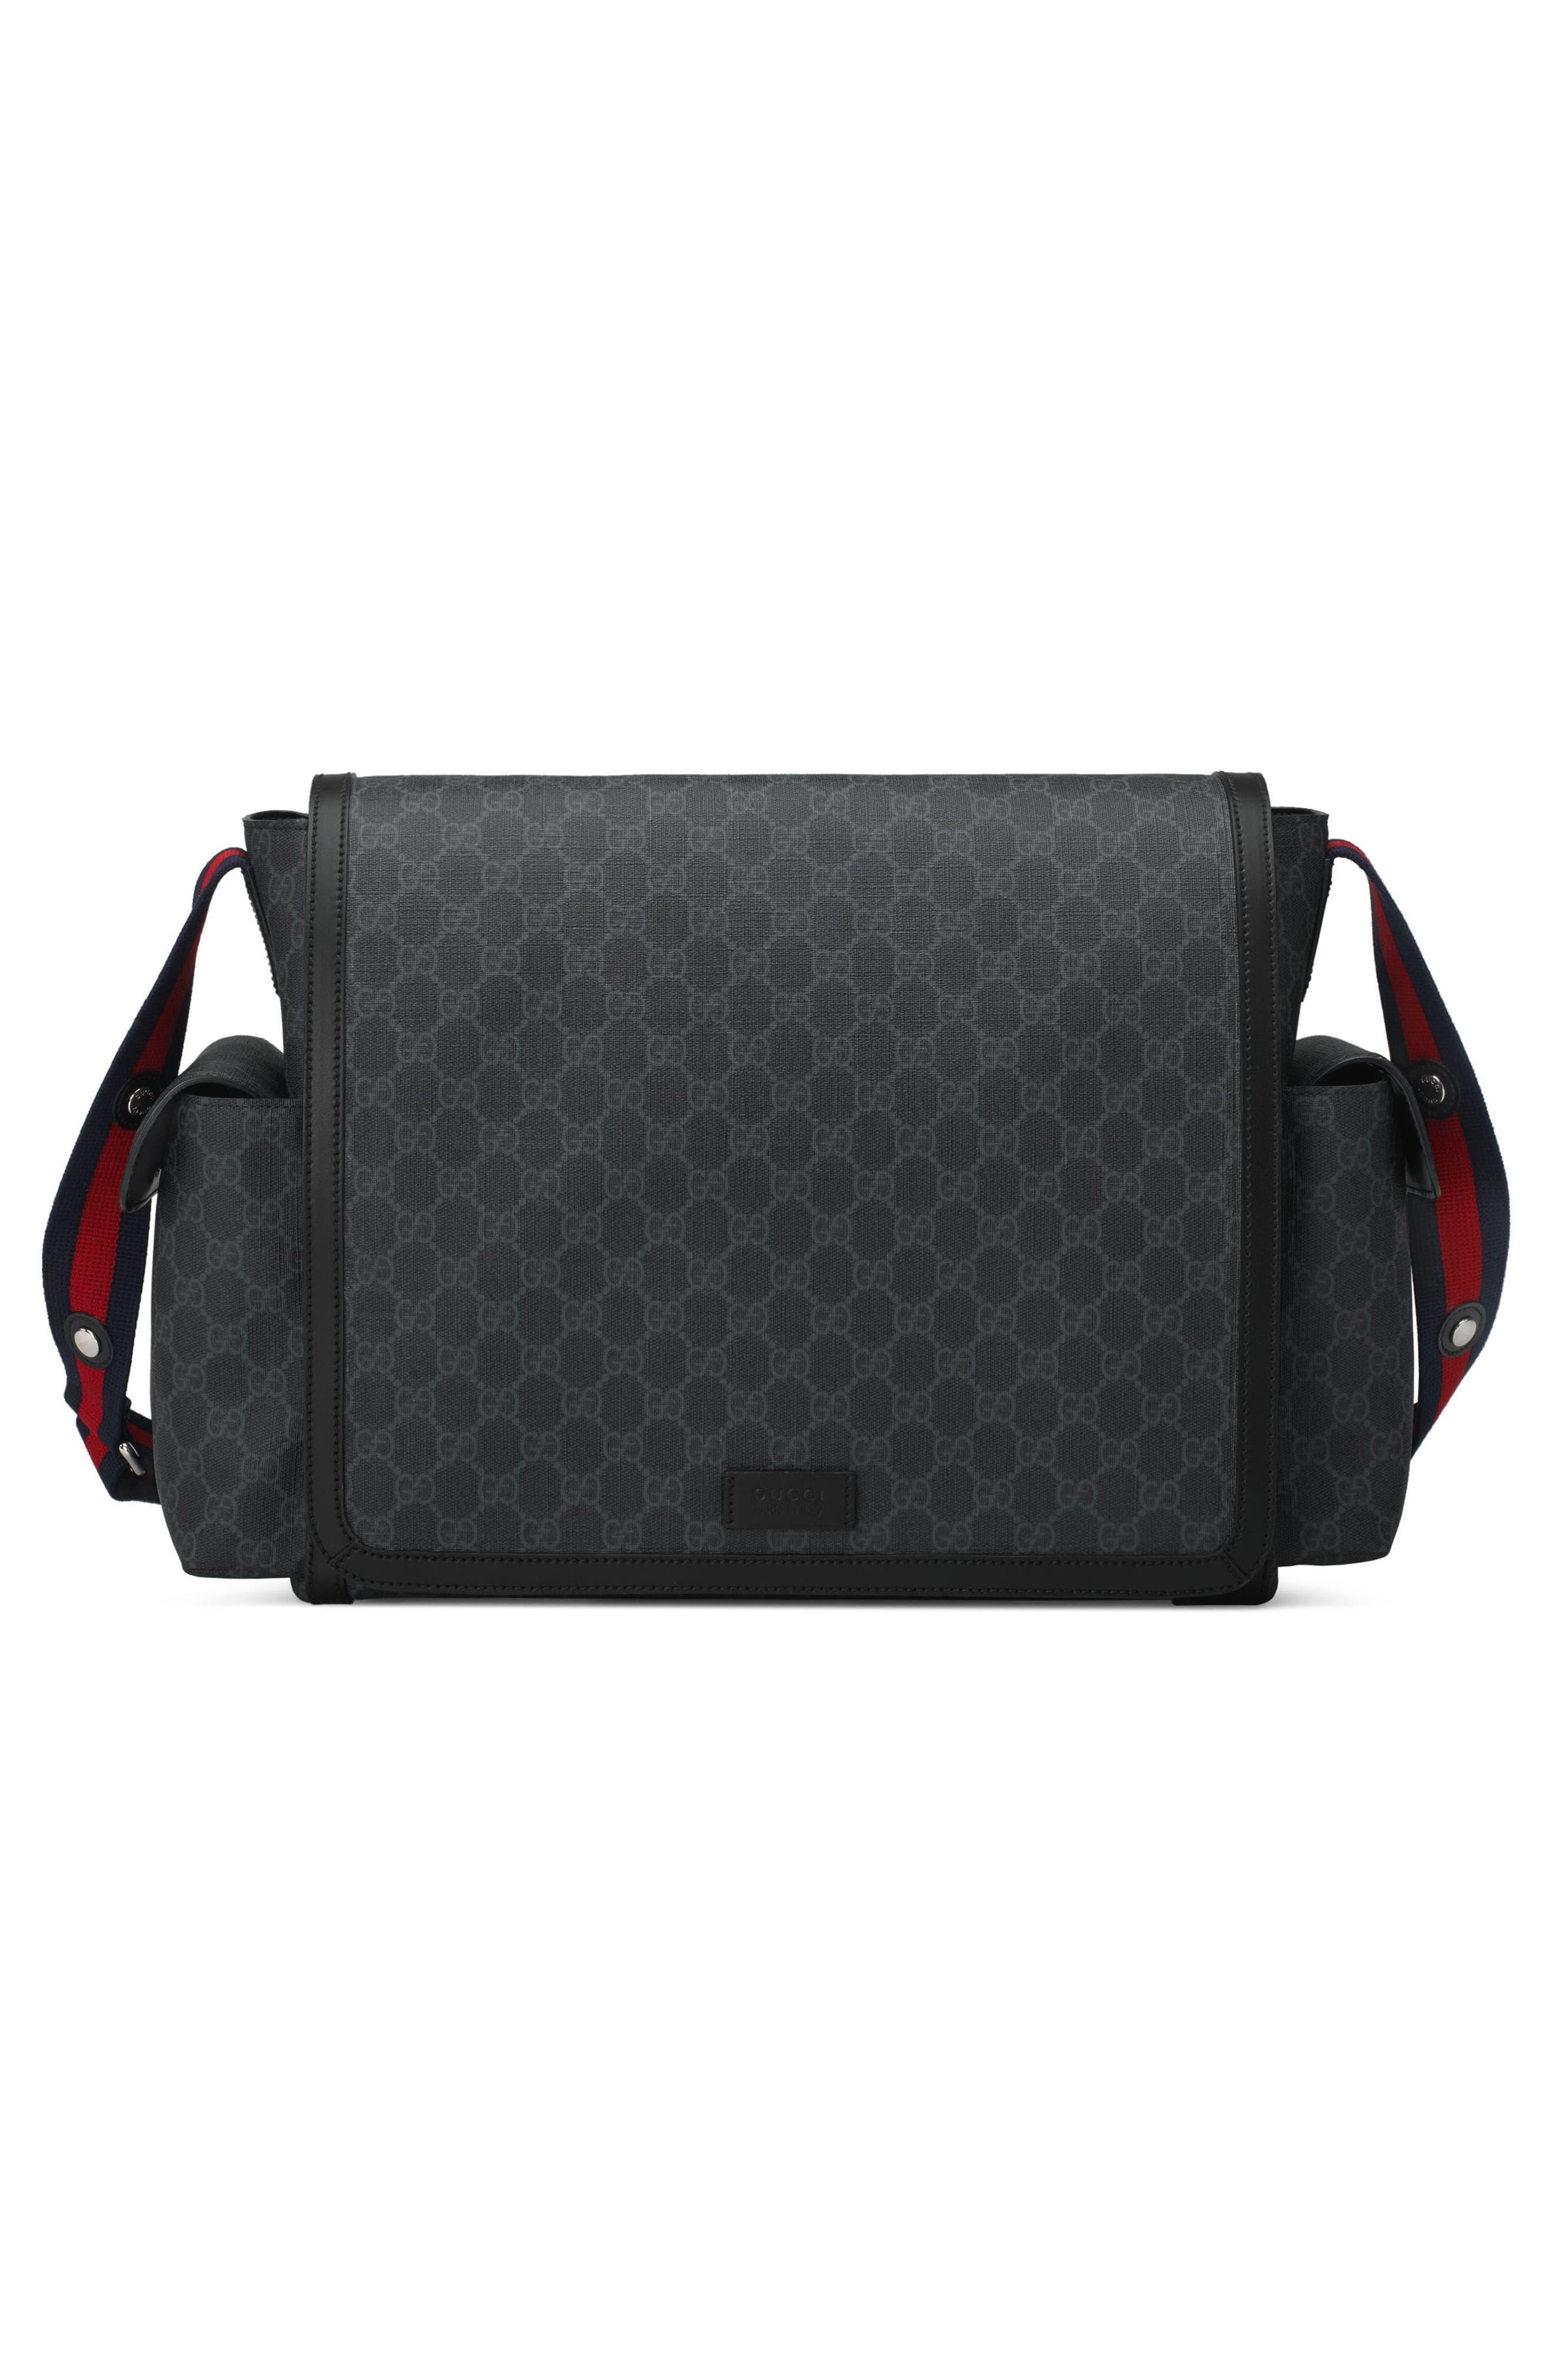 GG Supreme Canvas Diaper Bag,                             Alternate thumbnail 9, color,                             BLACK